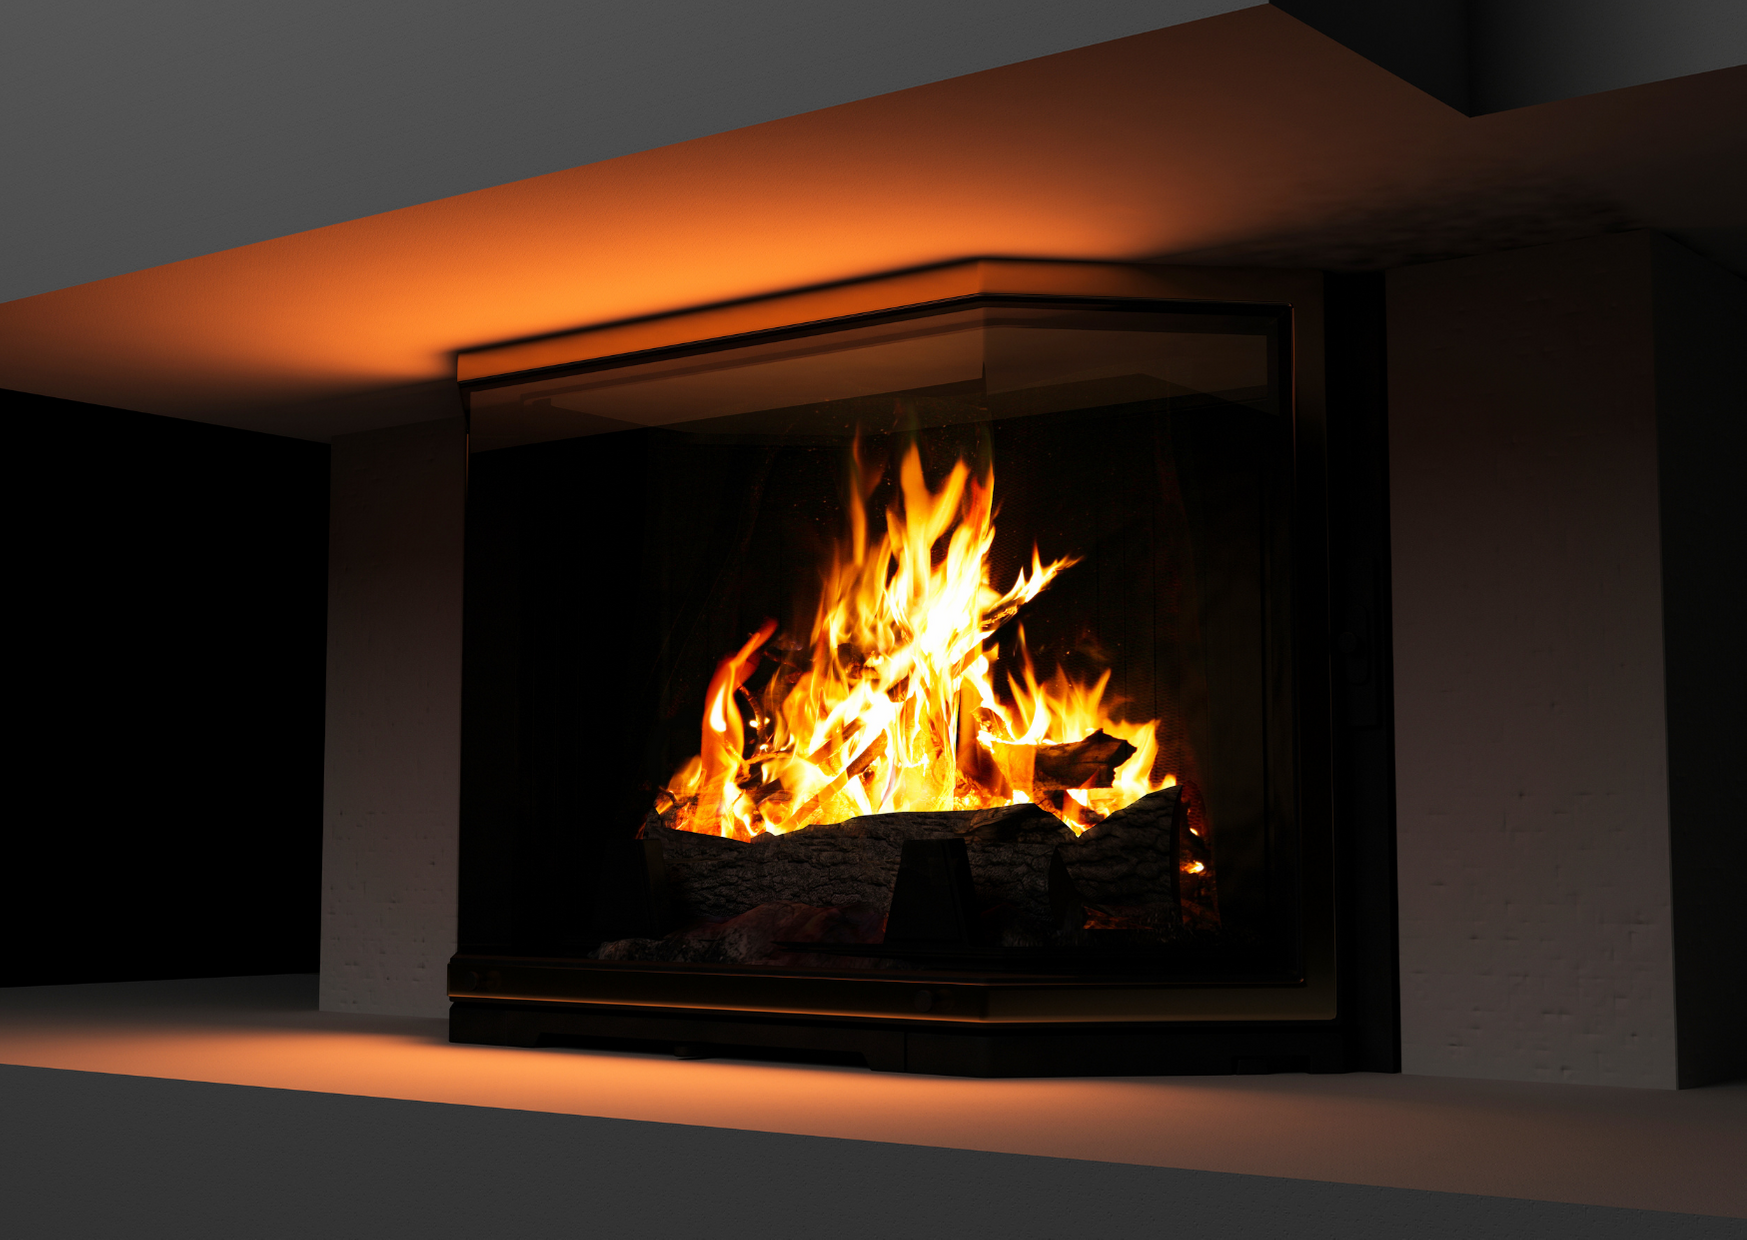 a fireplace inside the house